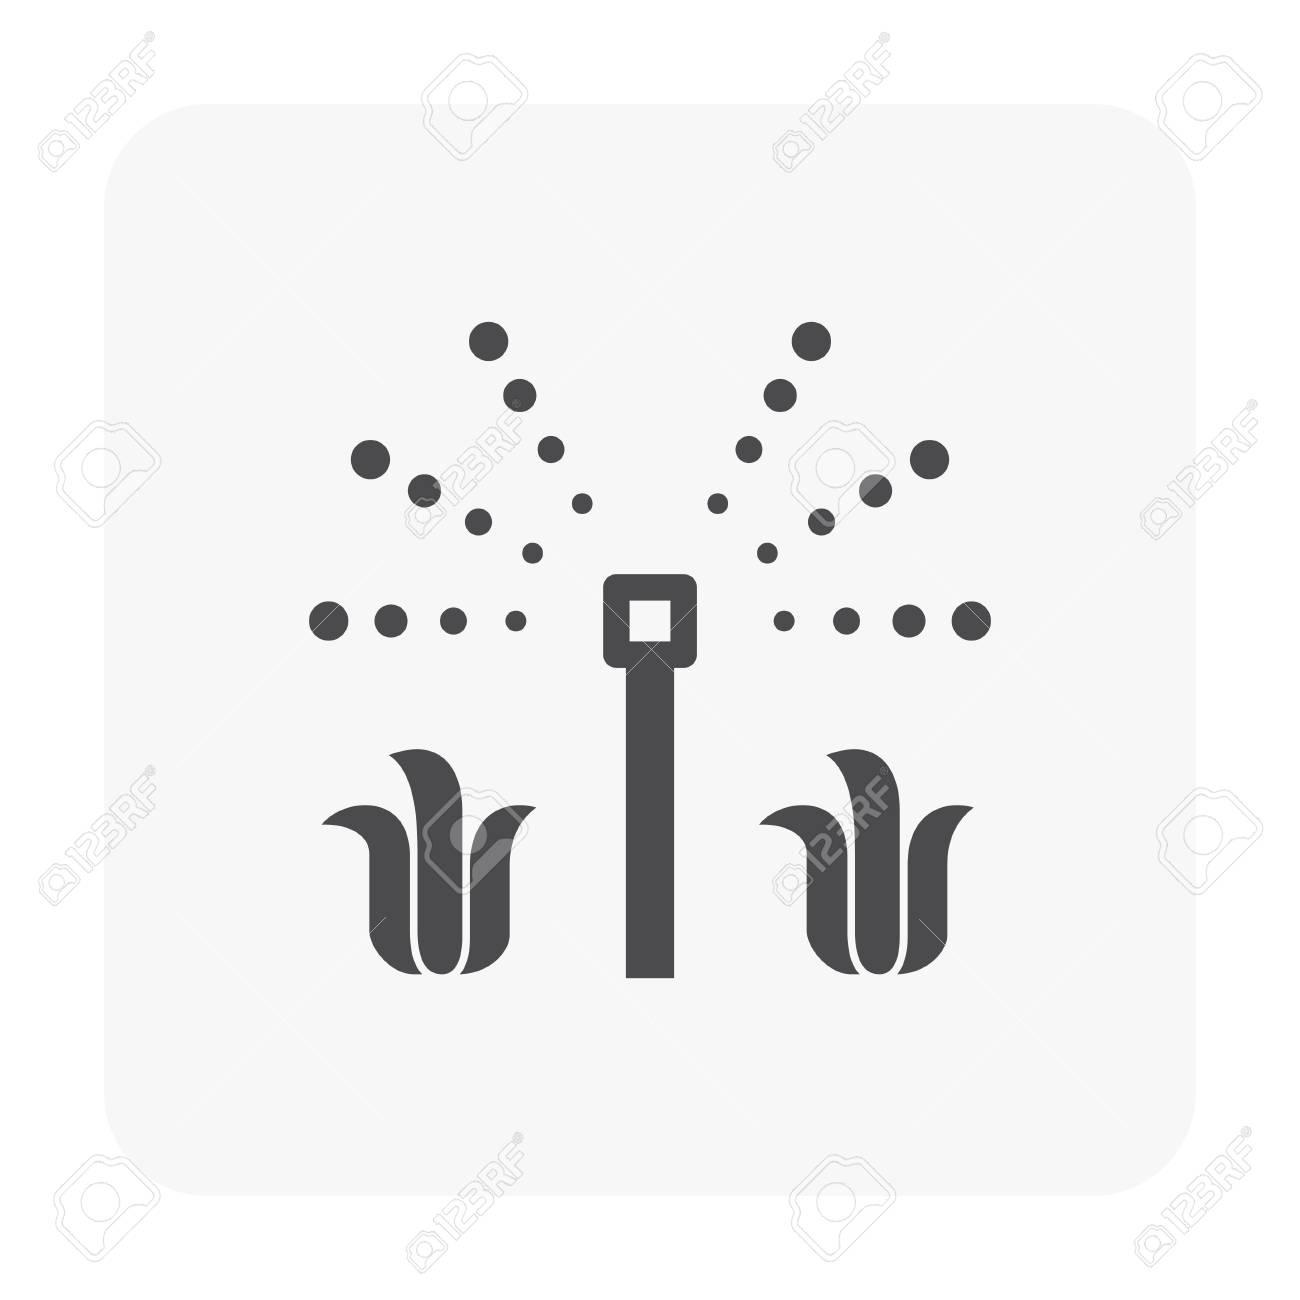 Water sprinkler icon on white. - 99884349